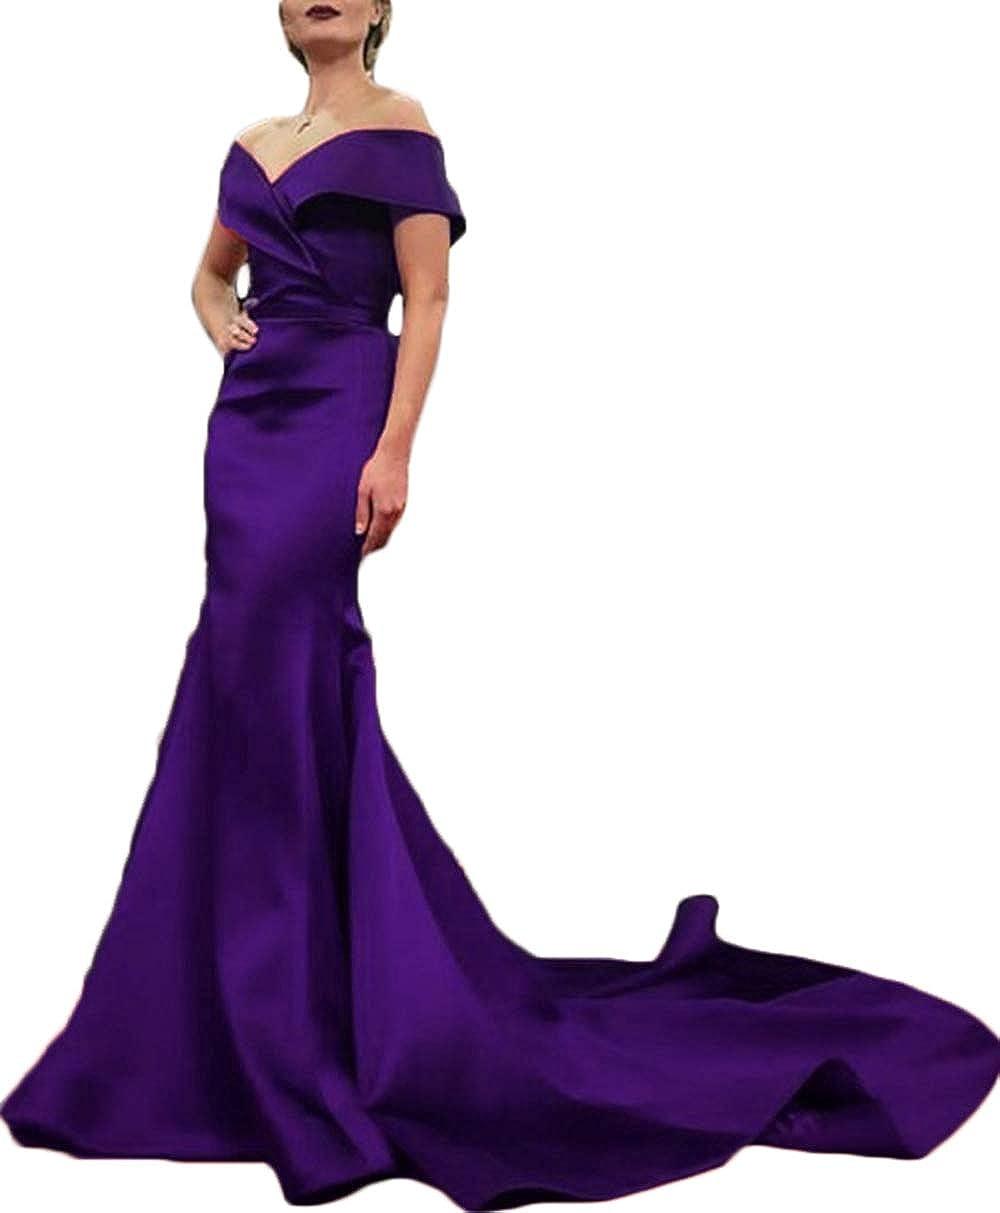 Dark Purple Rmaytiked Womens Off The Shoulder Mermaid Prom Dresses Long 2019 Elegant Satin Formal Evening Ball Gowns